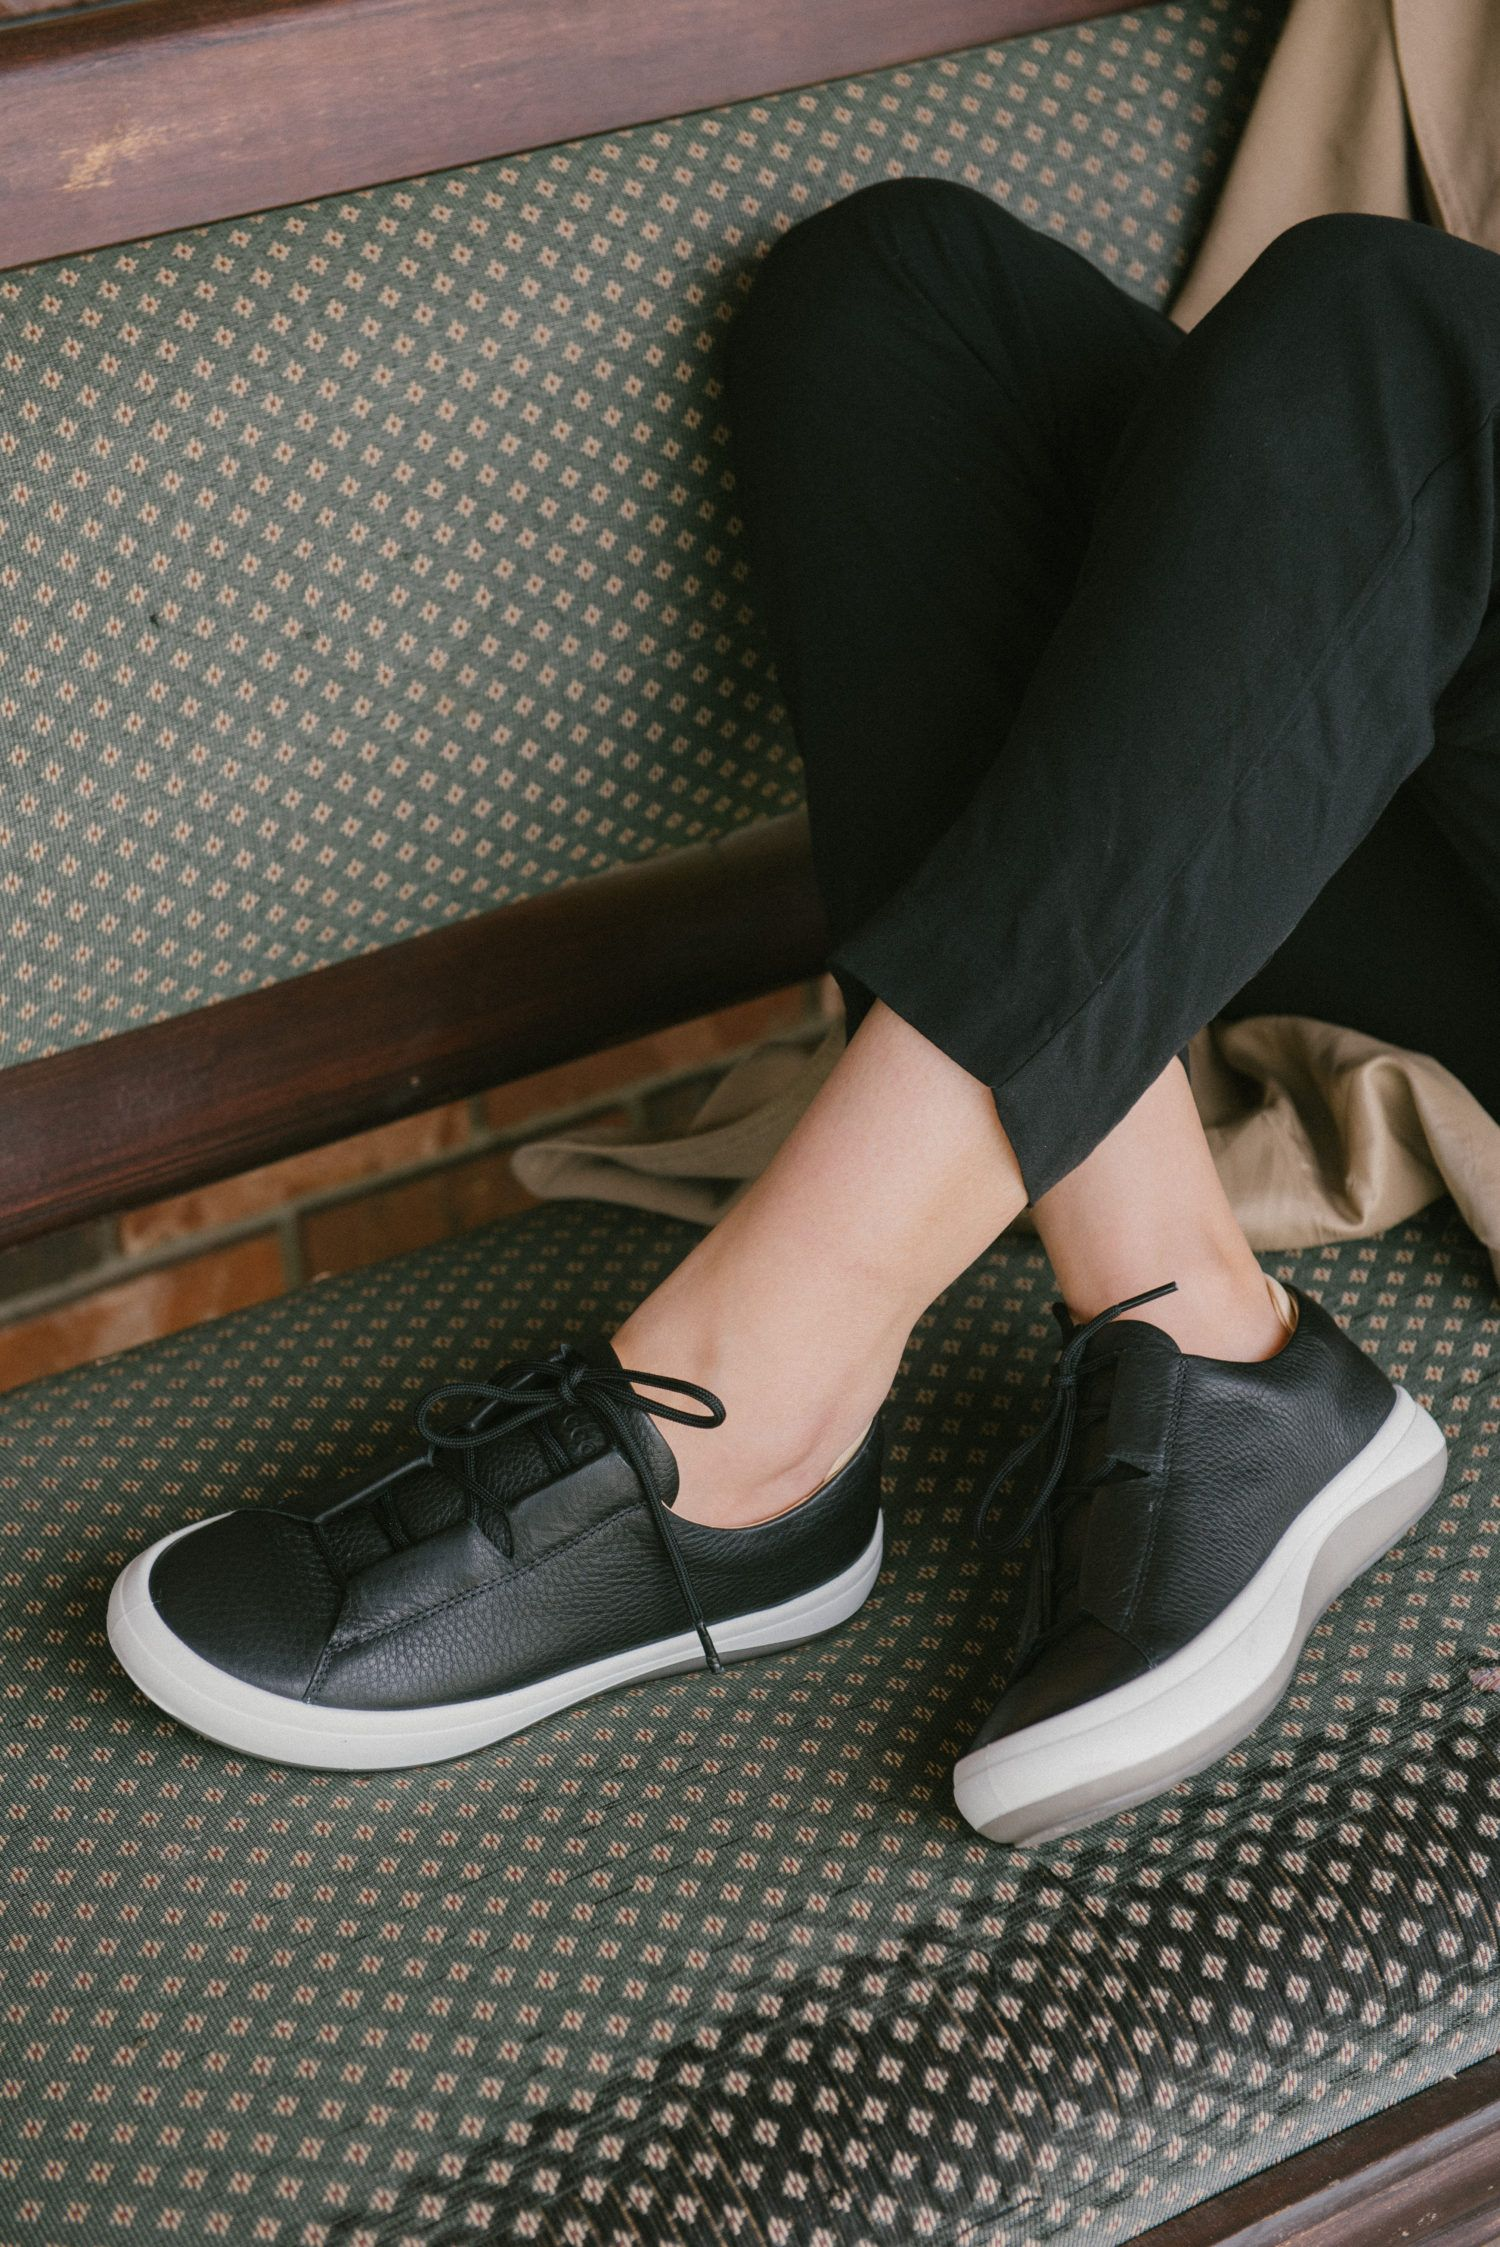 Black Runners Black Shoes Ecco Shoes Casual Shoes Minimal Shoes Fashion Blogger Fashion Post Minimal Shoes Ecco Shoes Women Ecco Shoes